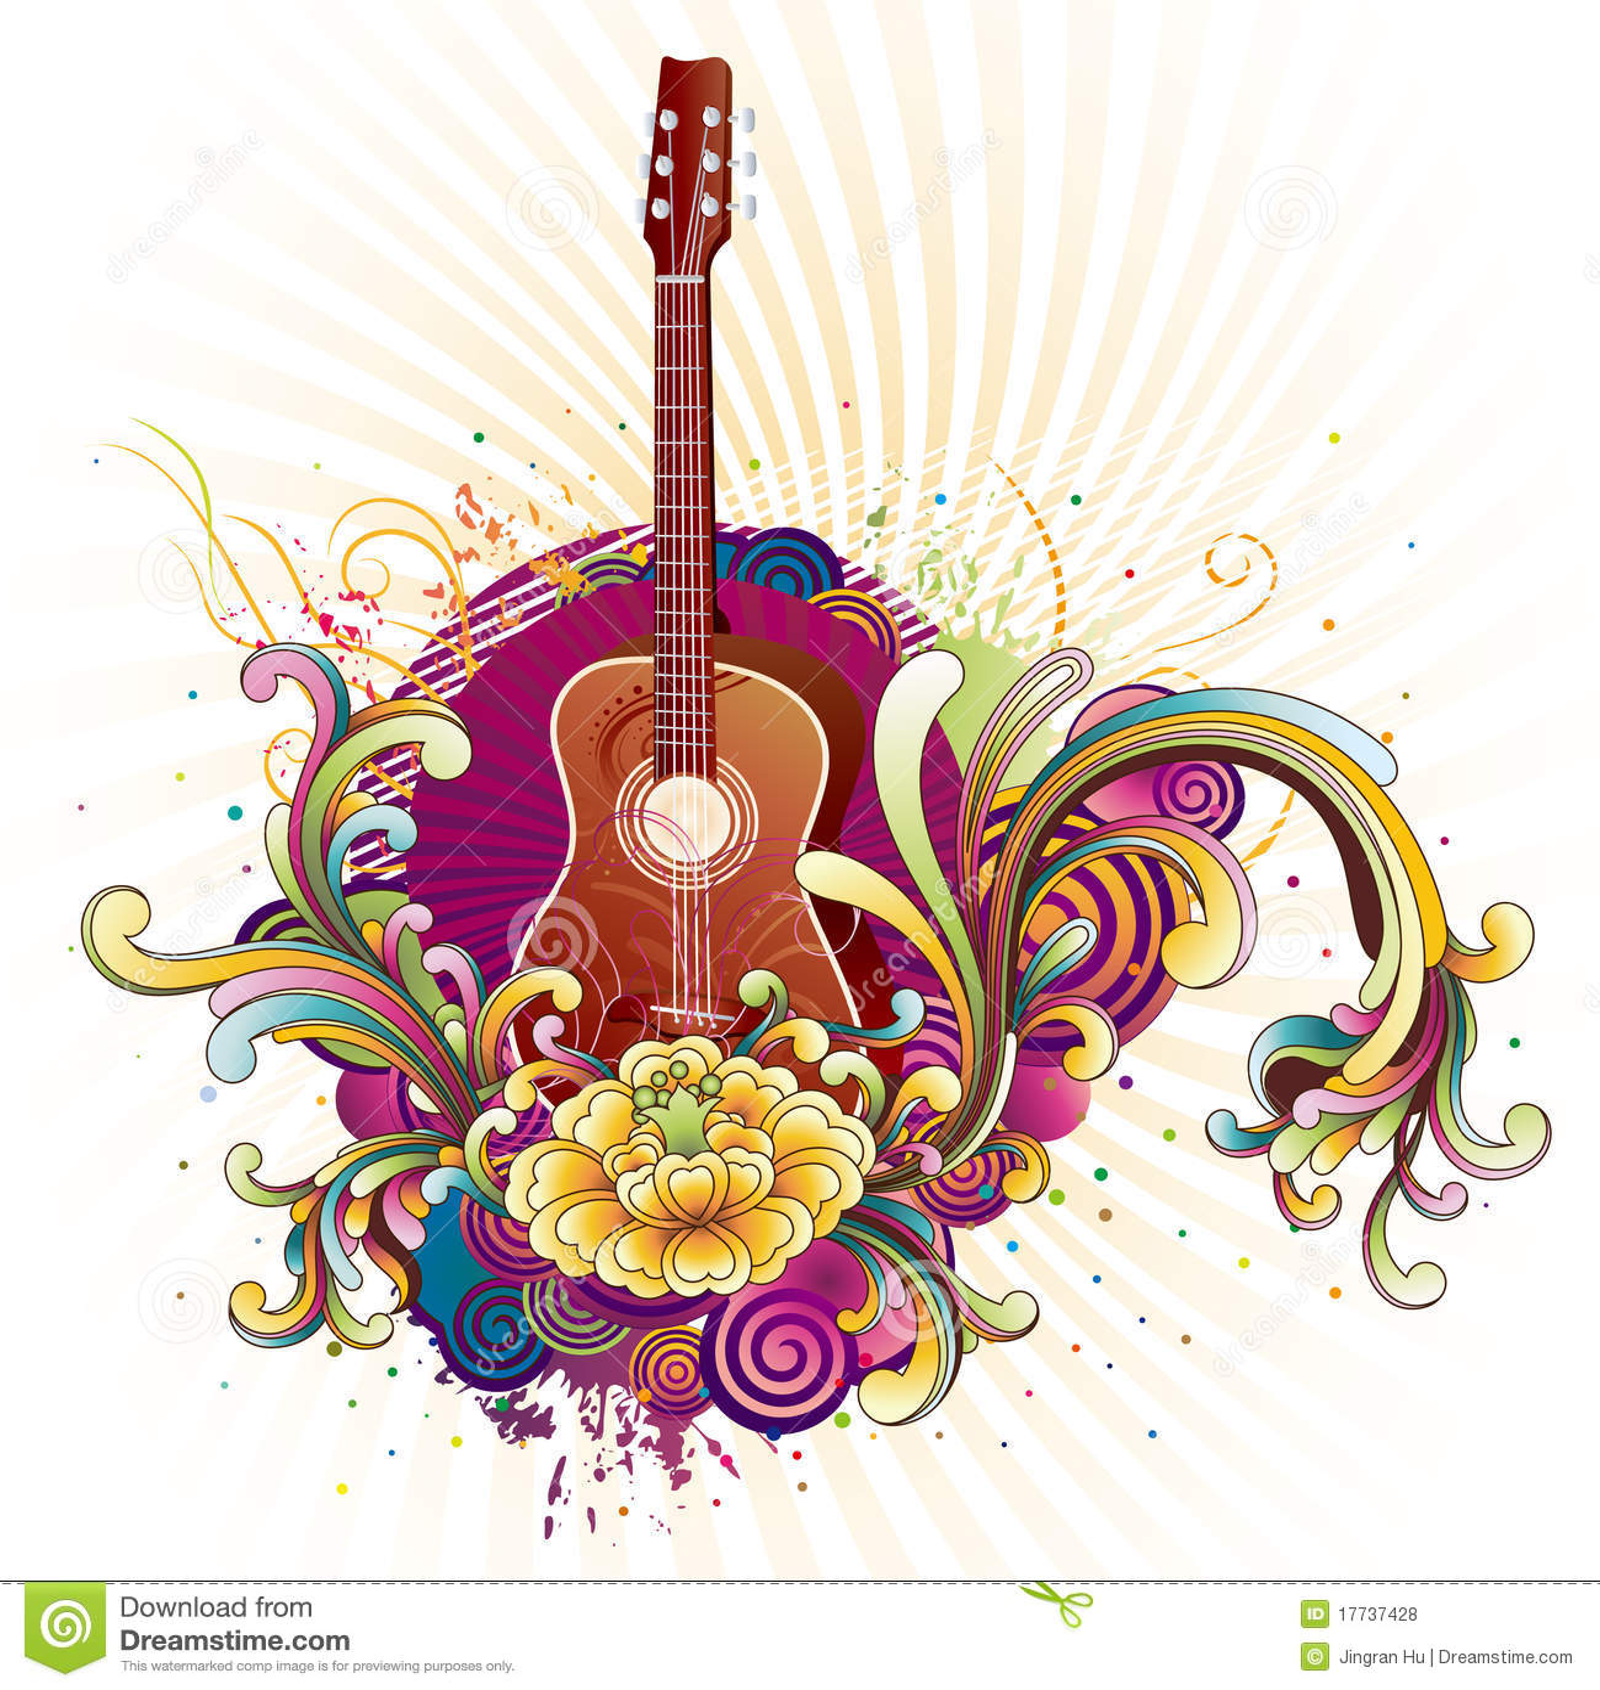 of musical theme music theme music theme music theme music theme